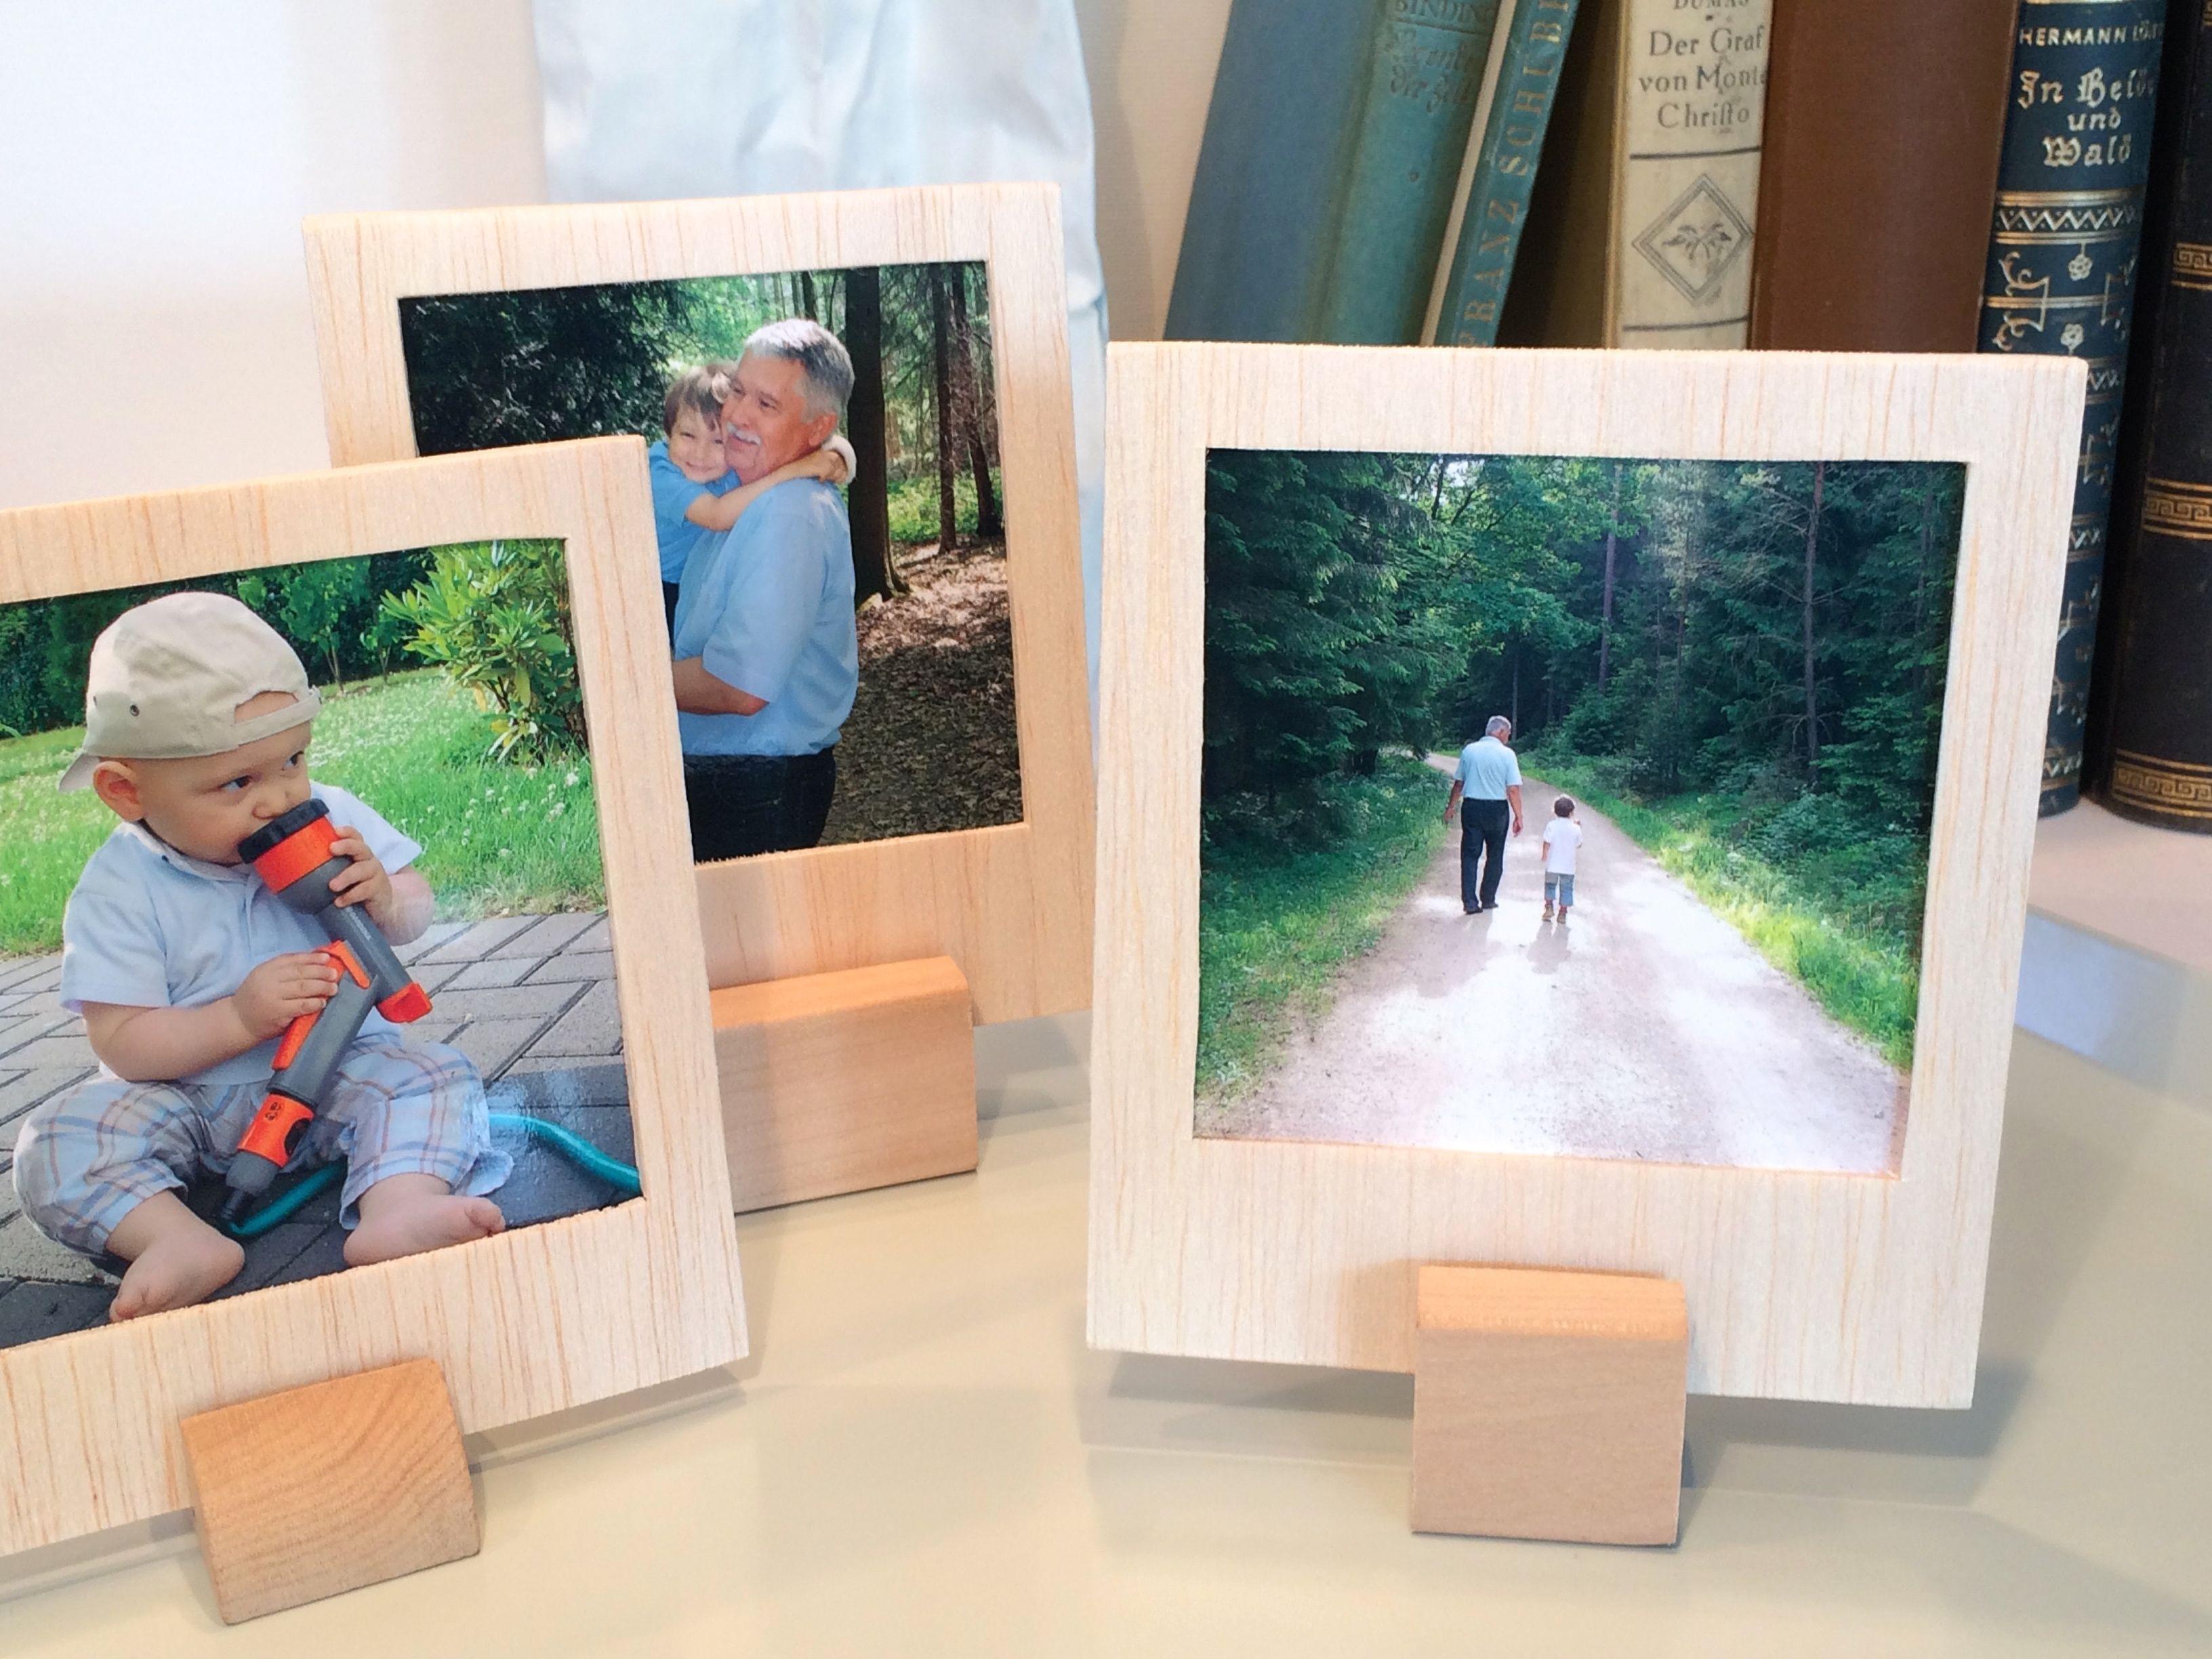 Bilderrahmen aus Holz in Polaroid-Optik | Polaroid